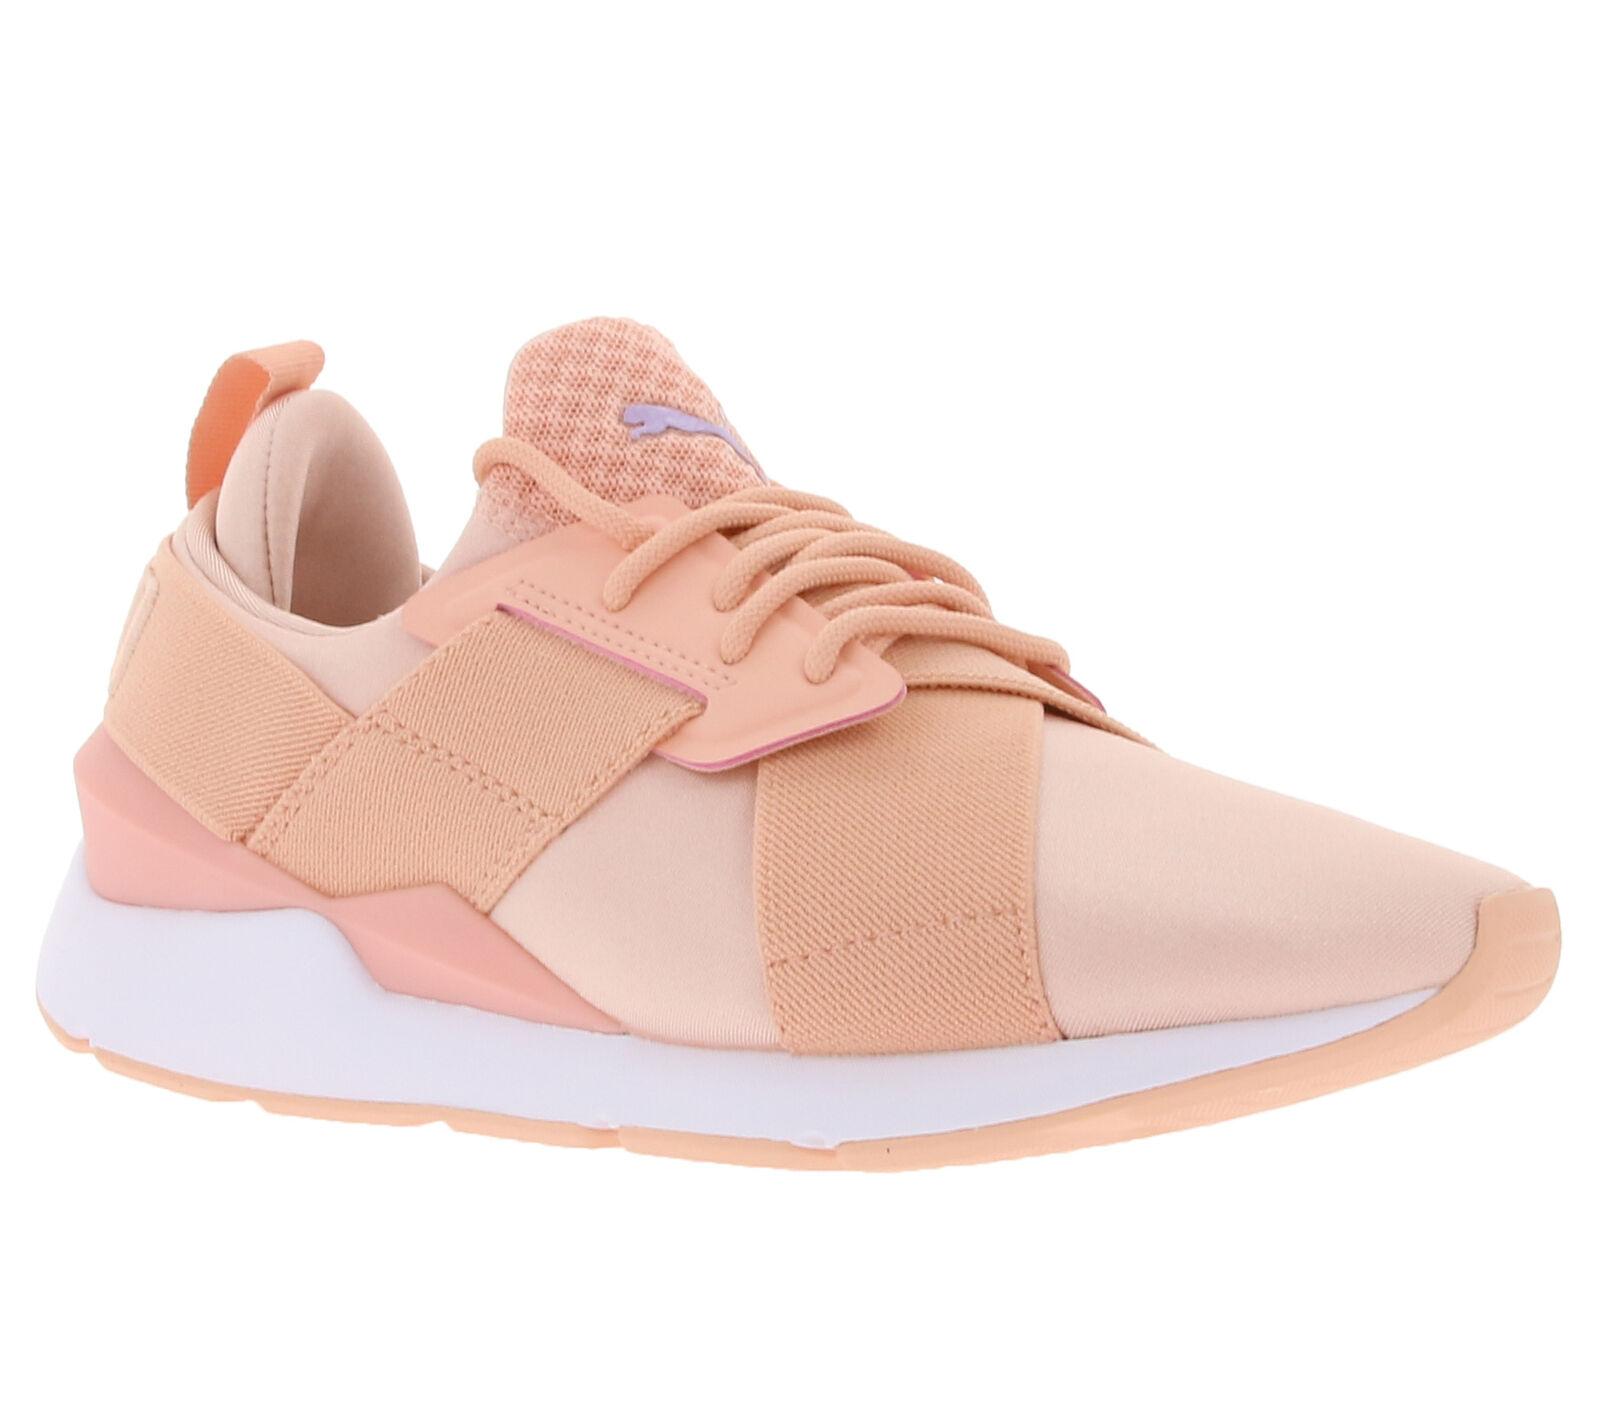 Schuhe Rosa Damen Turnschuhe Test Vergleich +++ Schuhe Rosa